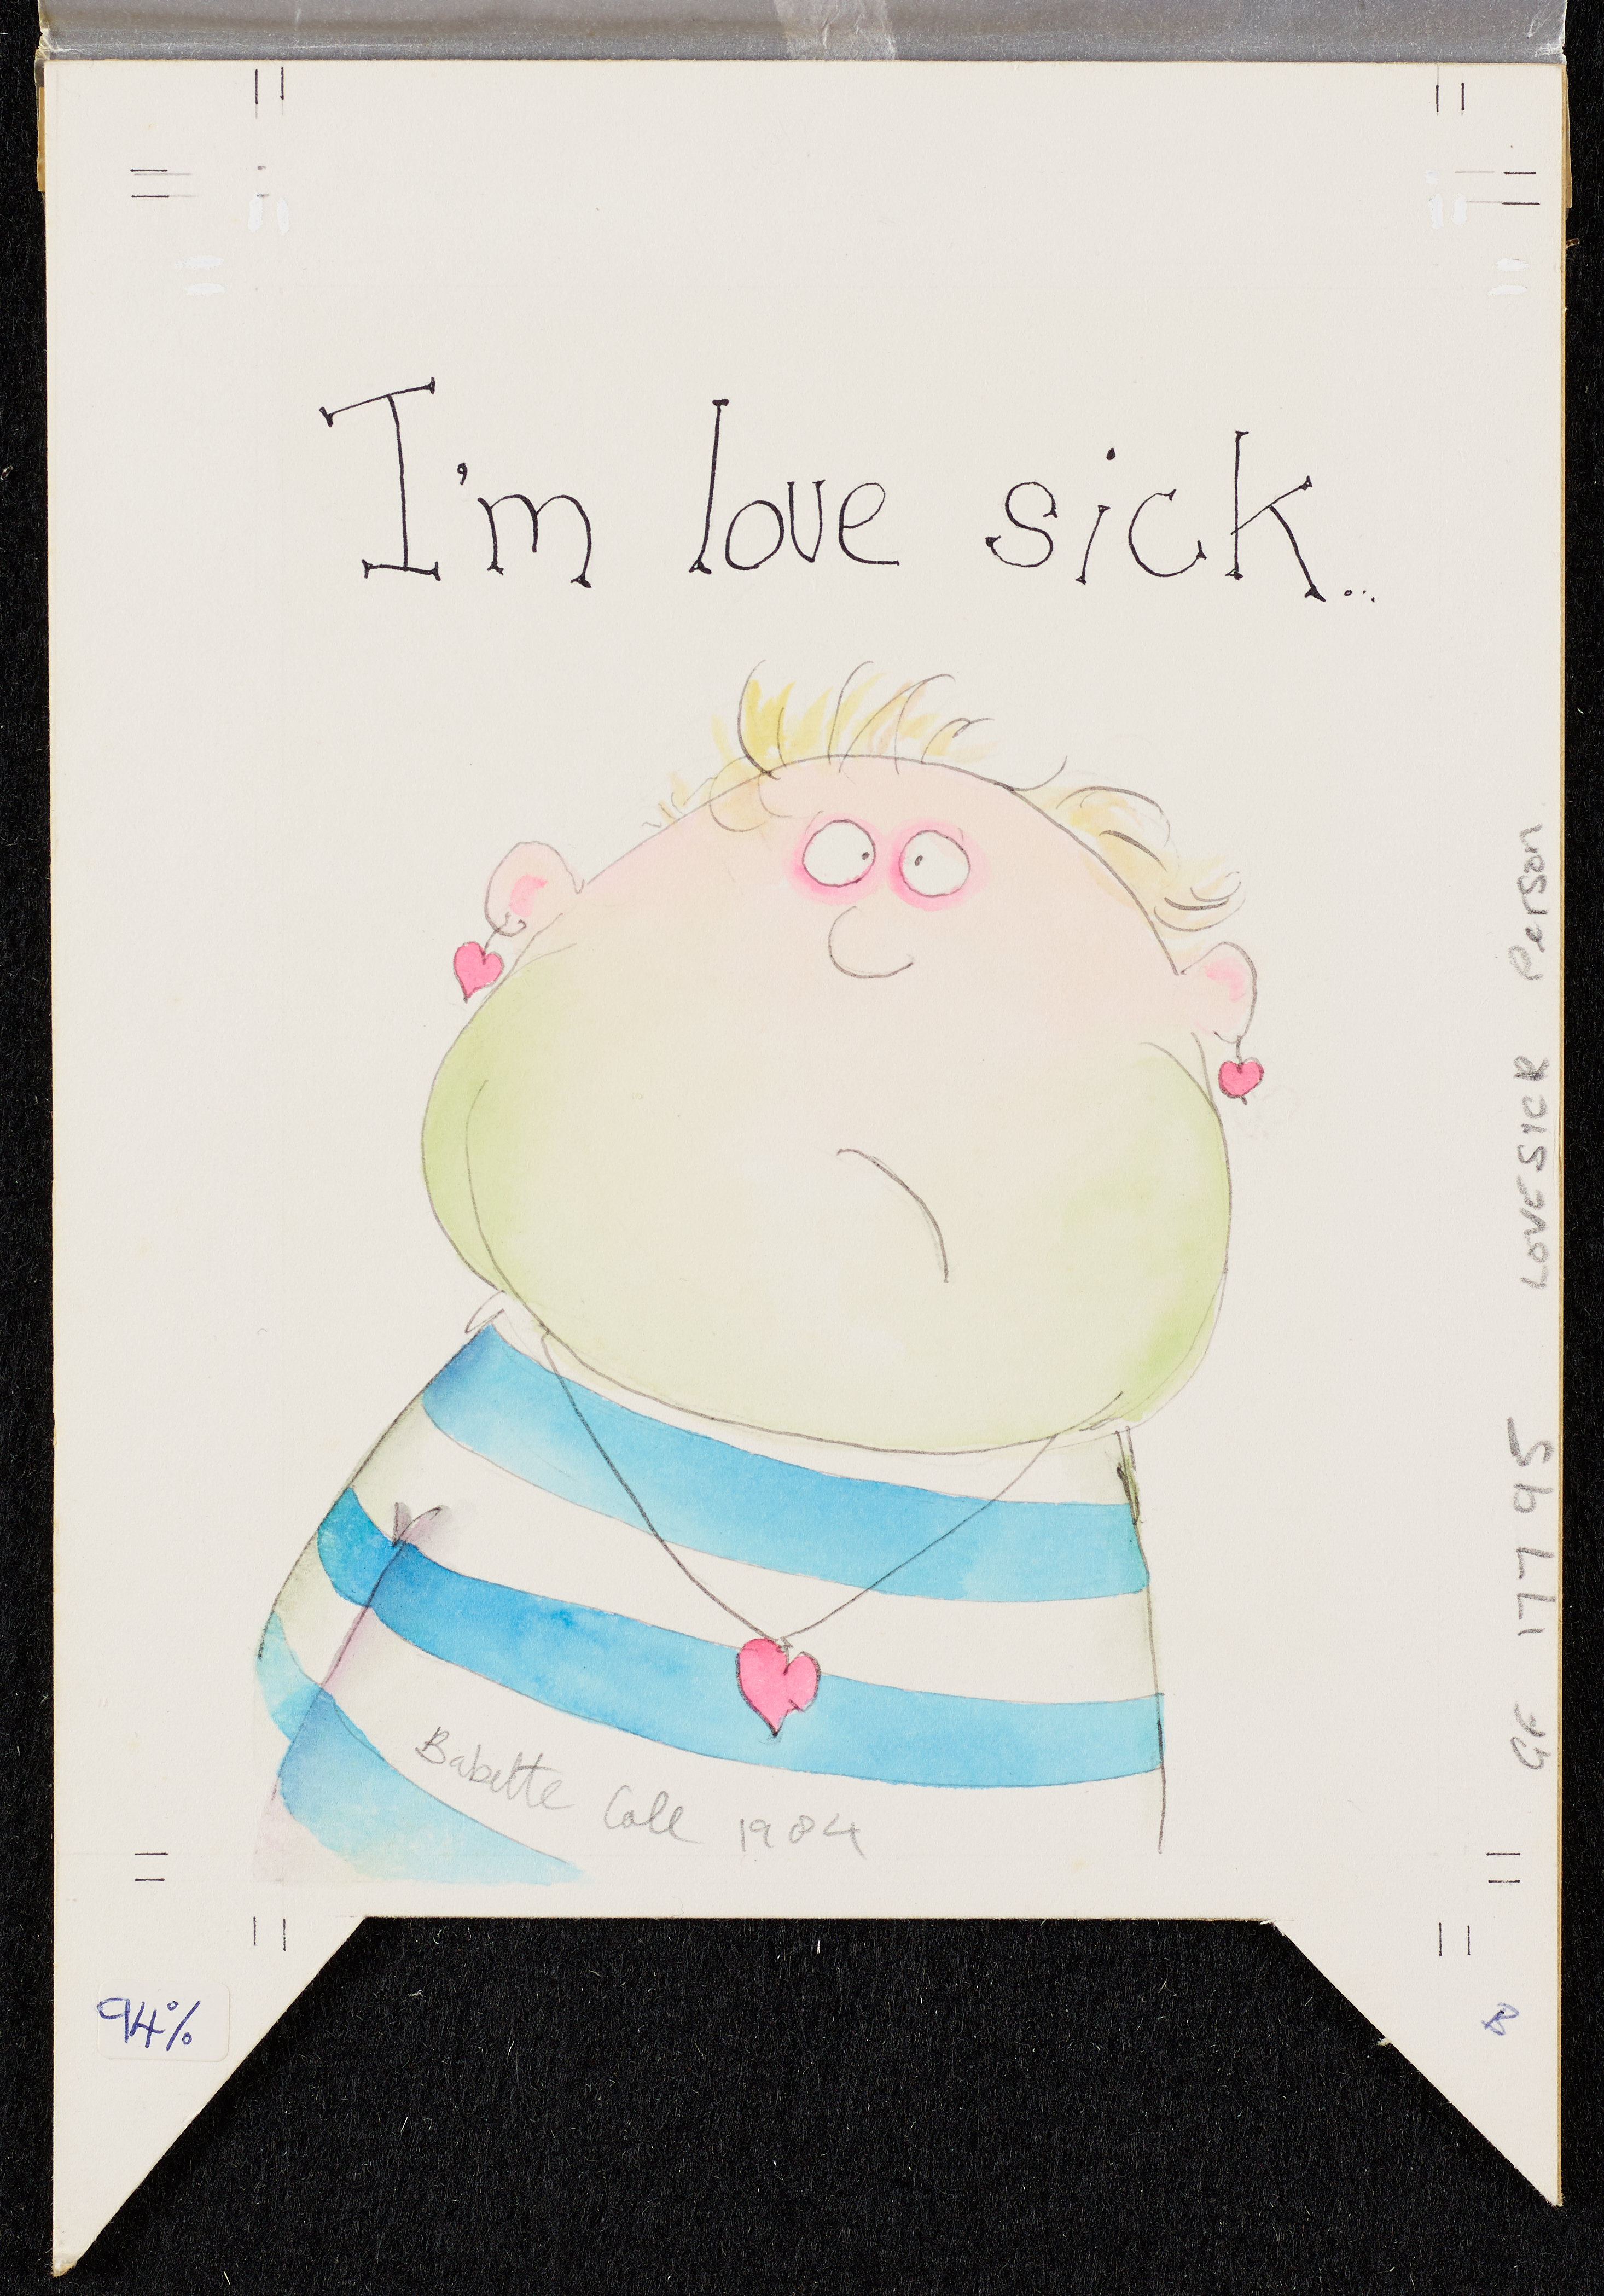 I'm love sick